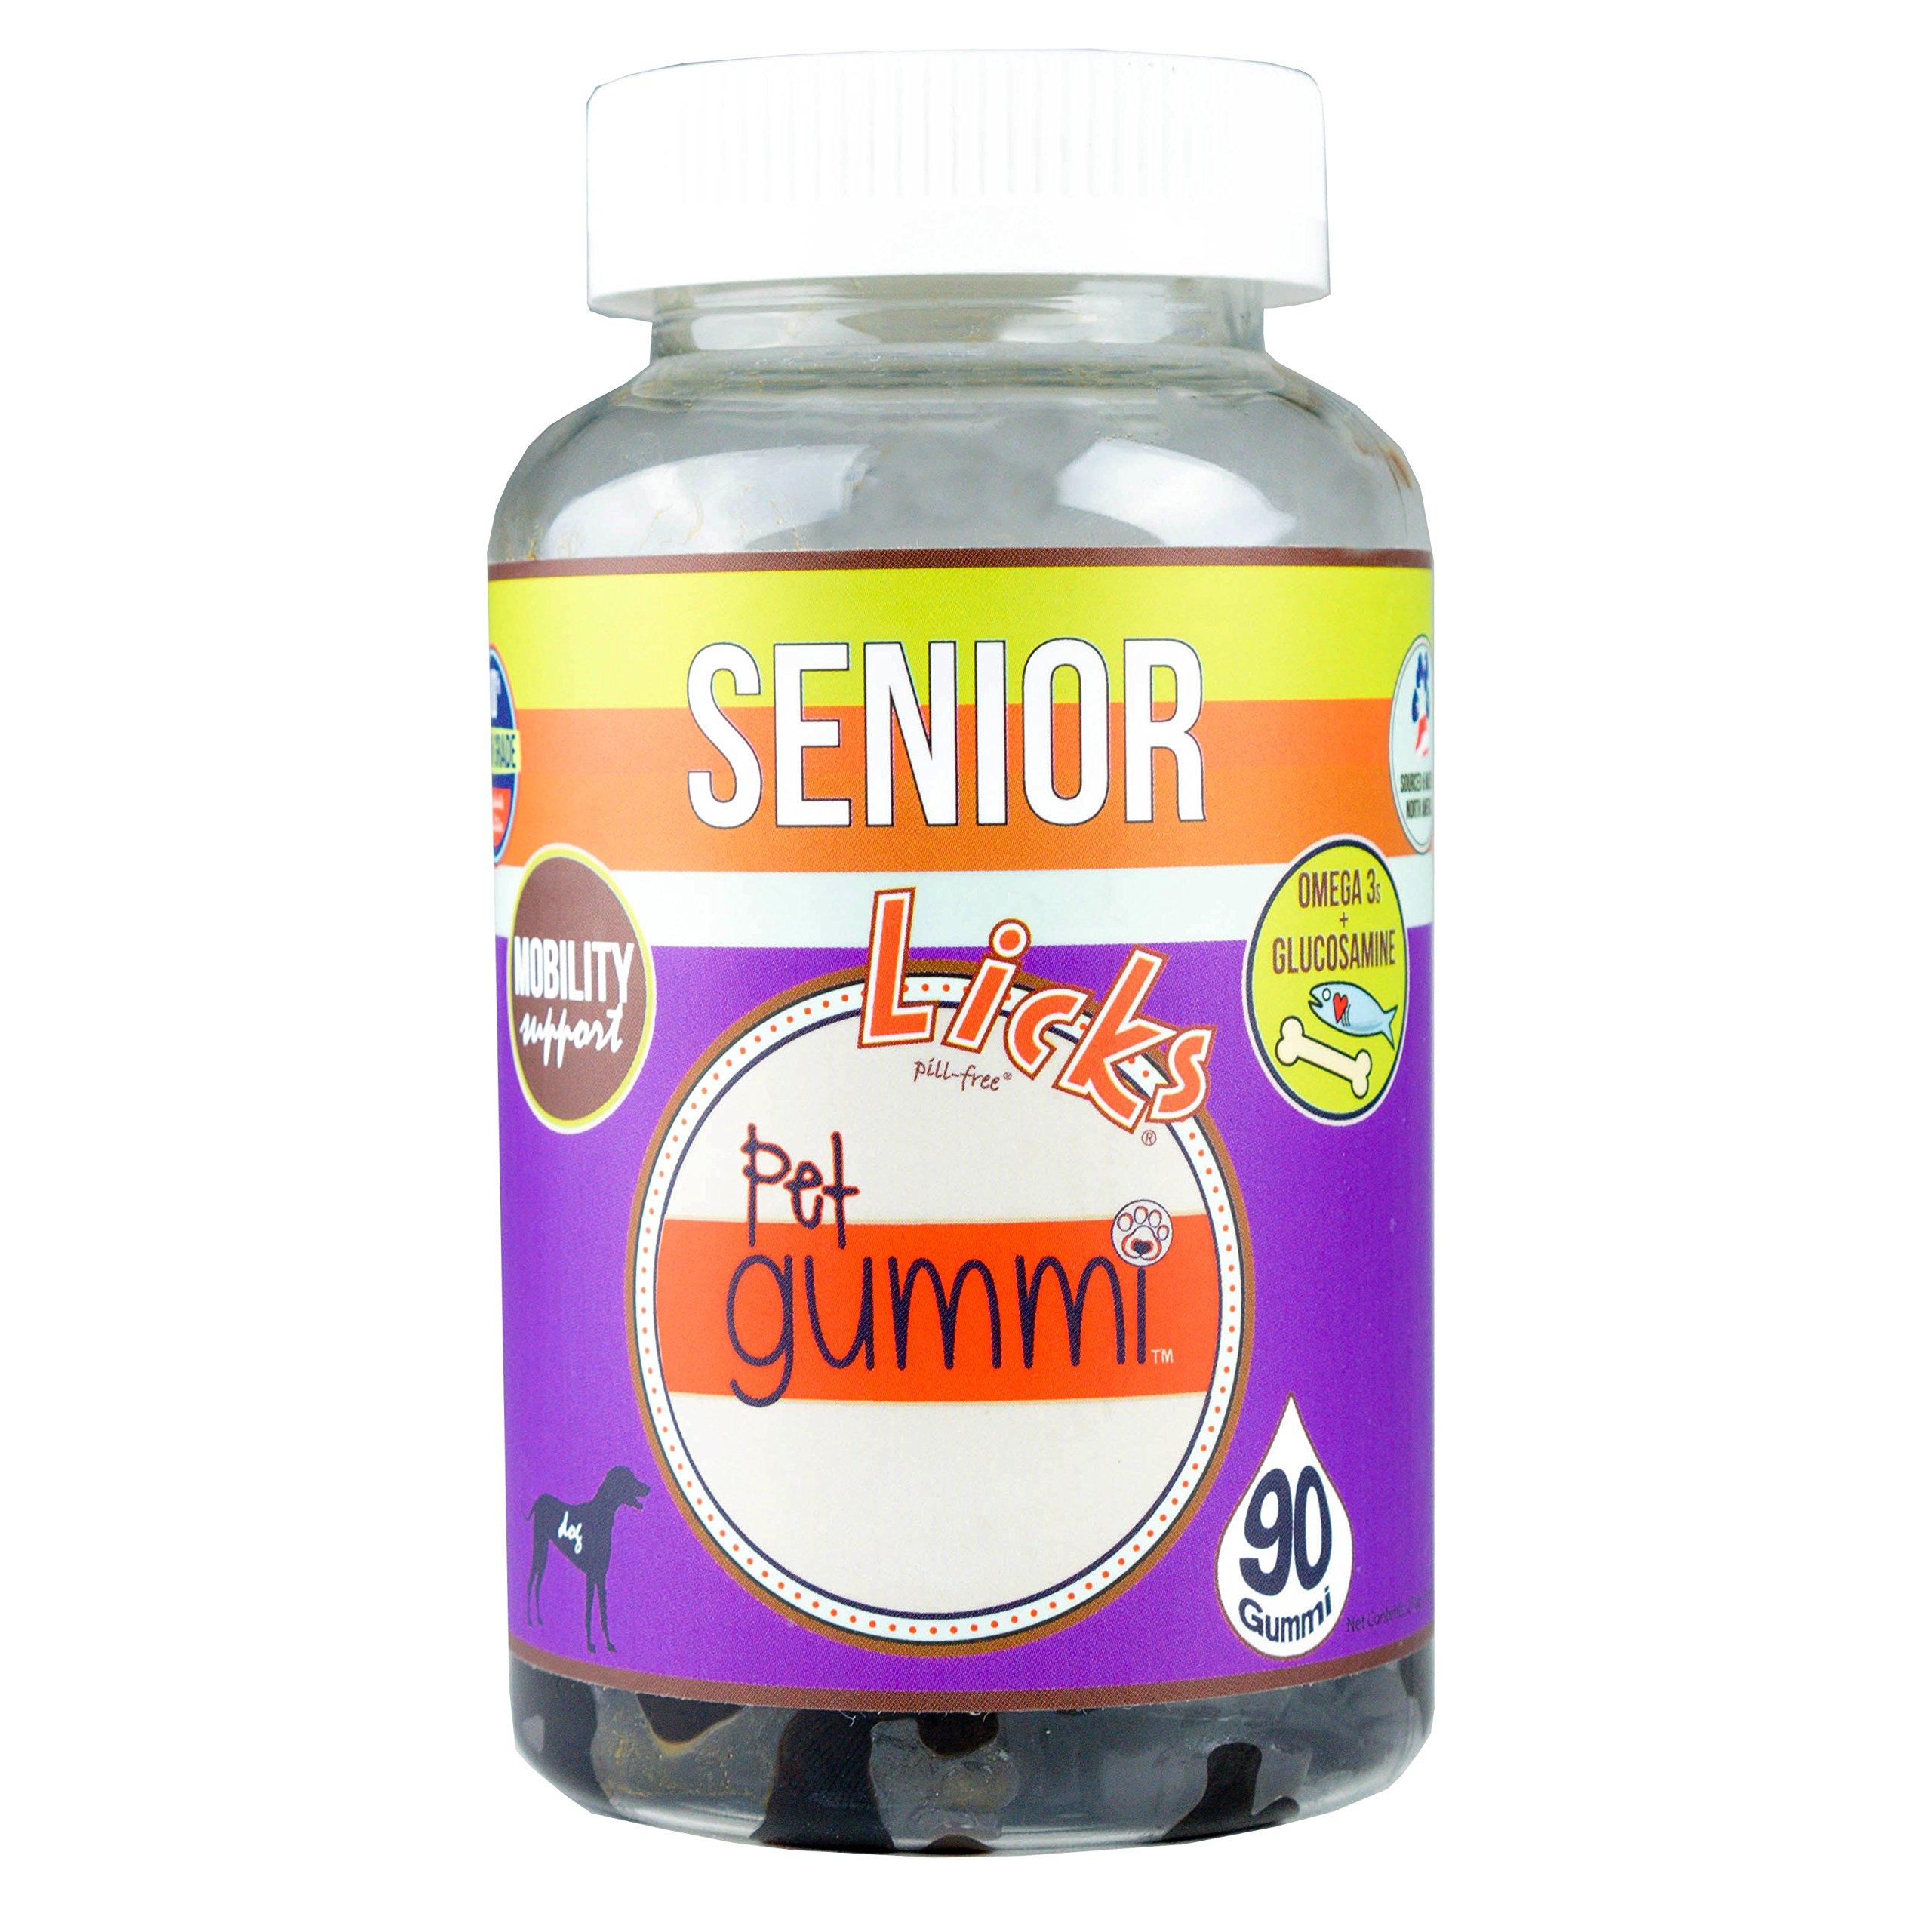 NEW! LICKS Dog Senior Pet Gummi Vitamins - 90-count